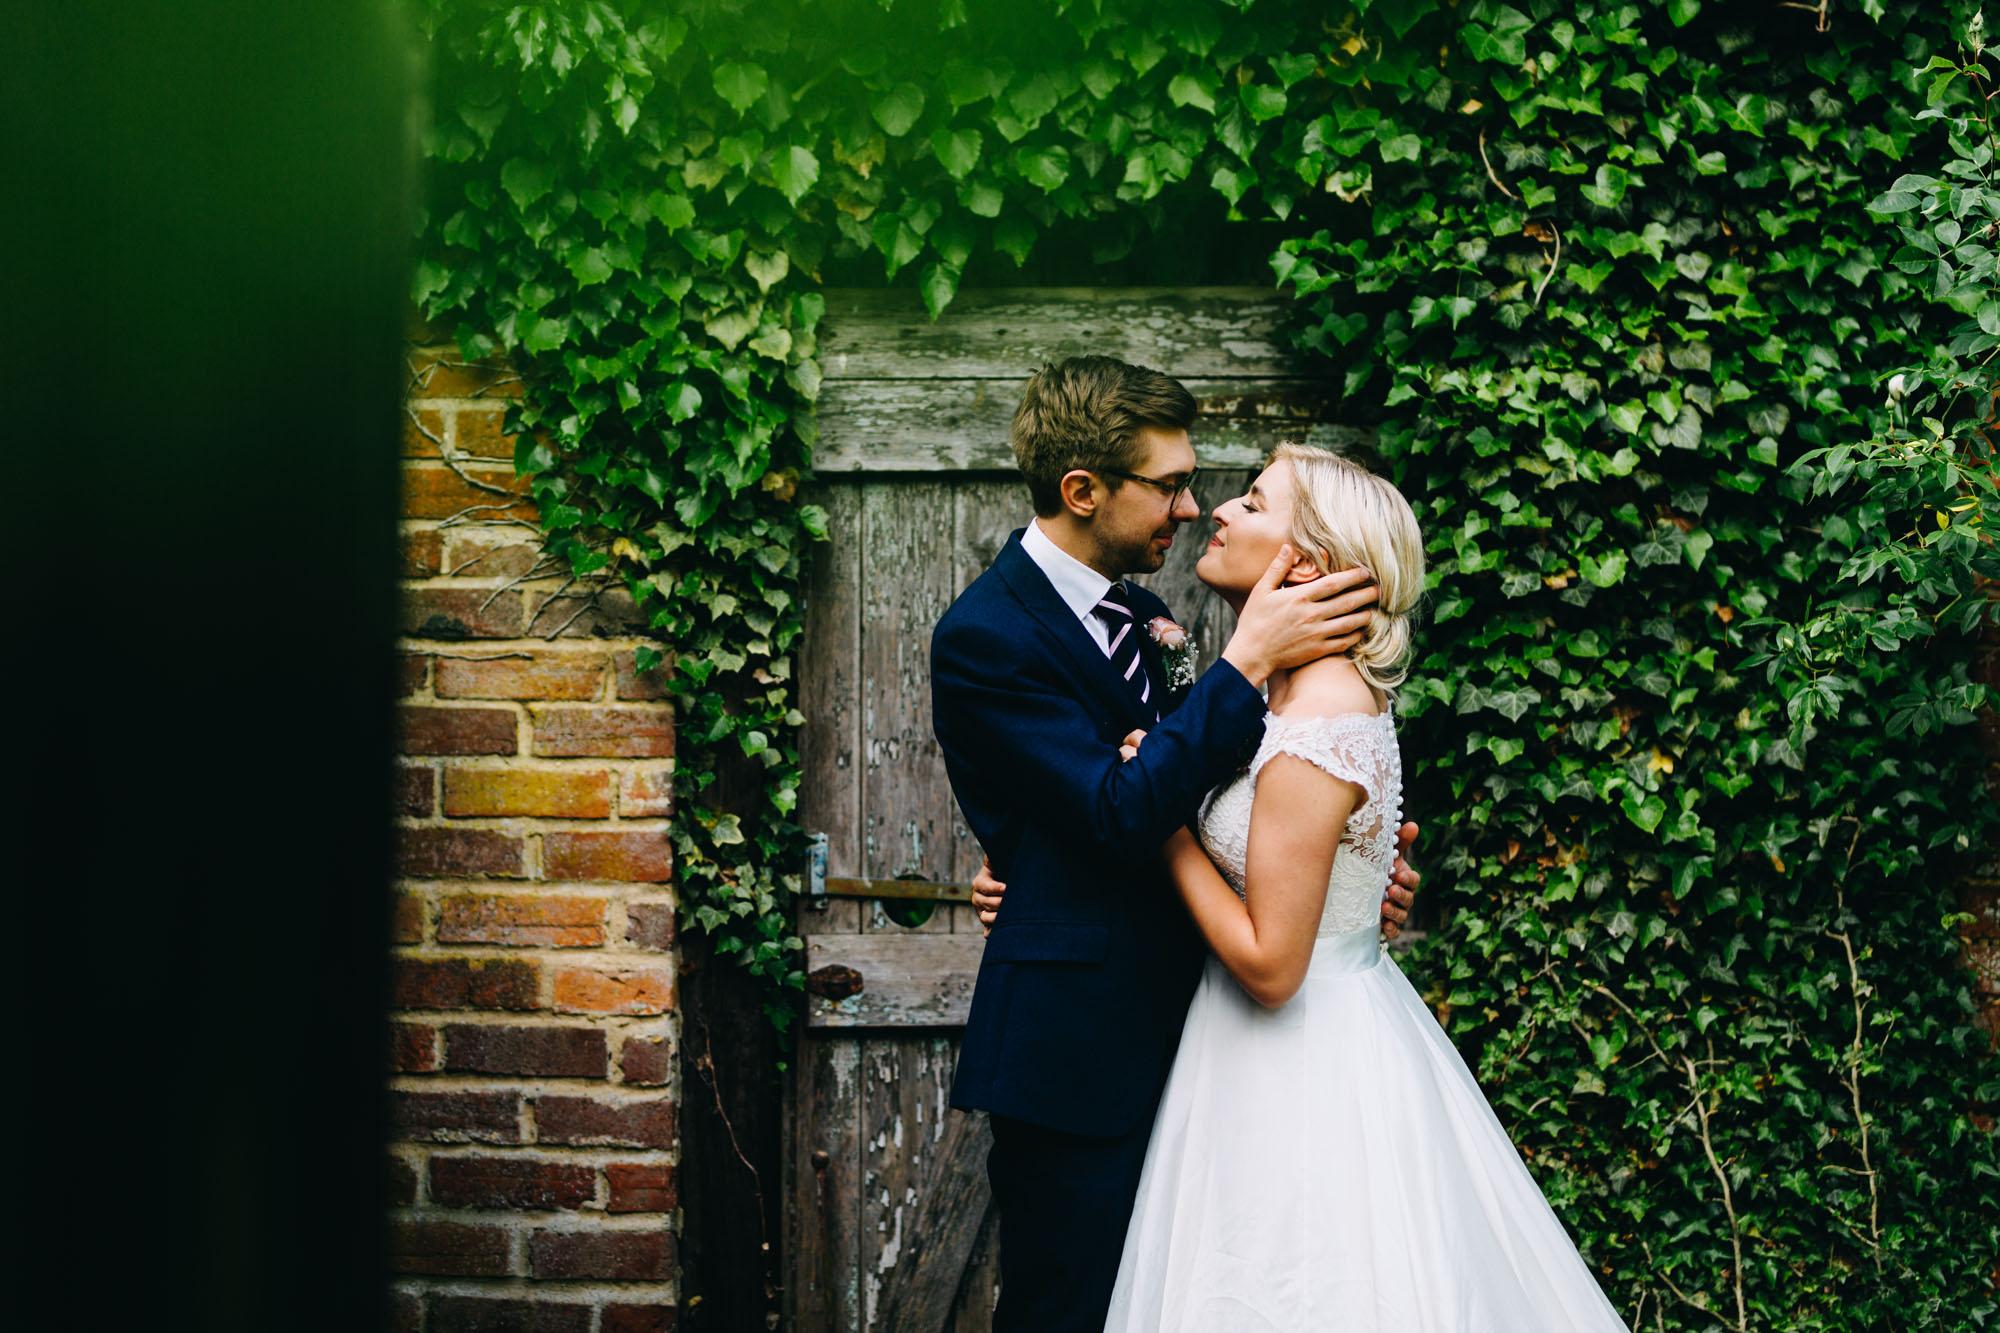 book-theme-wedding-dodmoor-house-54